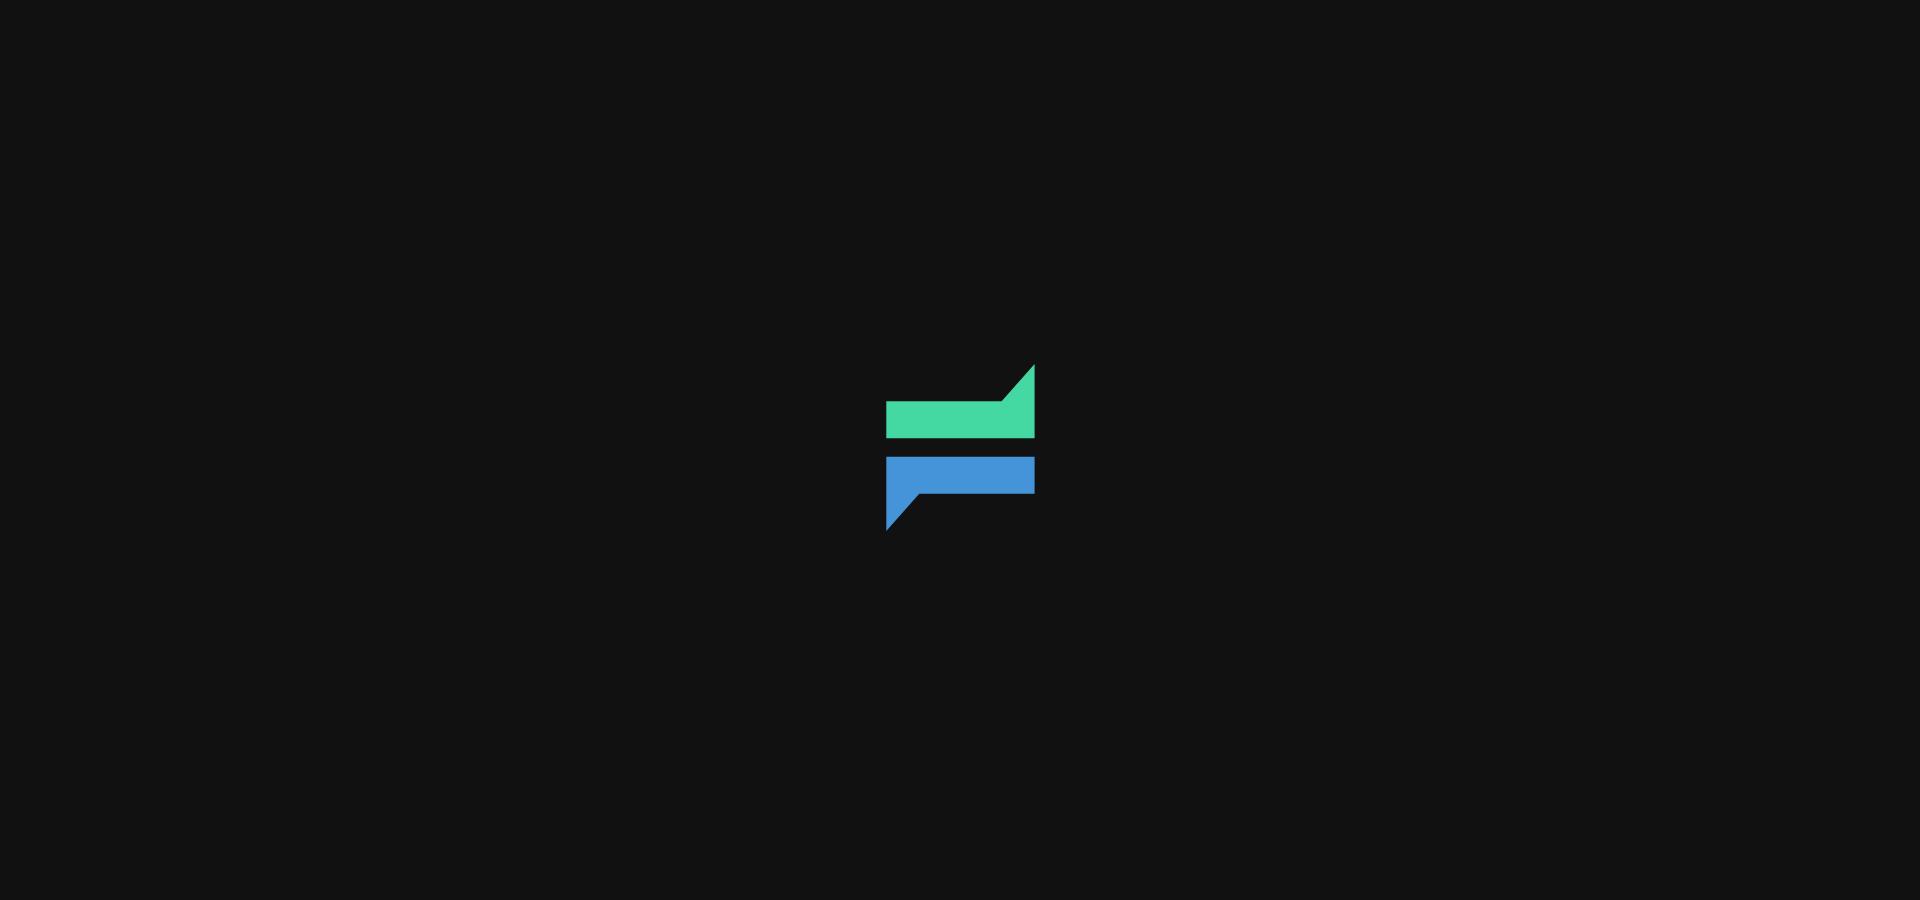 Dominik-Pacholczyk-Logo-Design-Collection-19